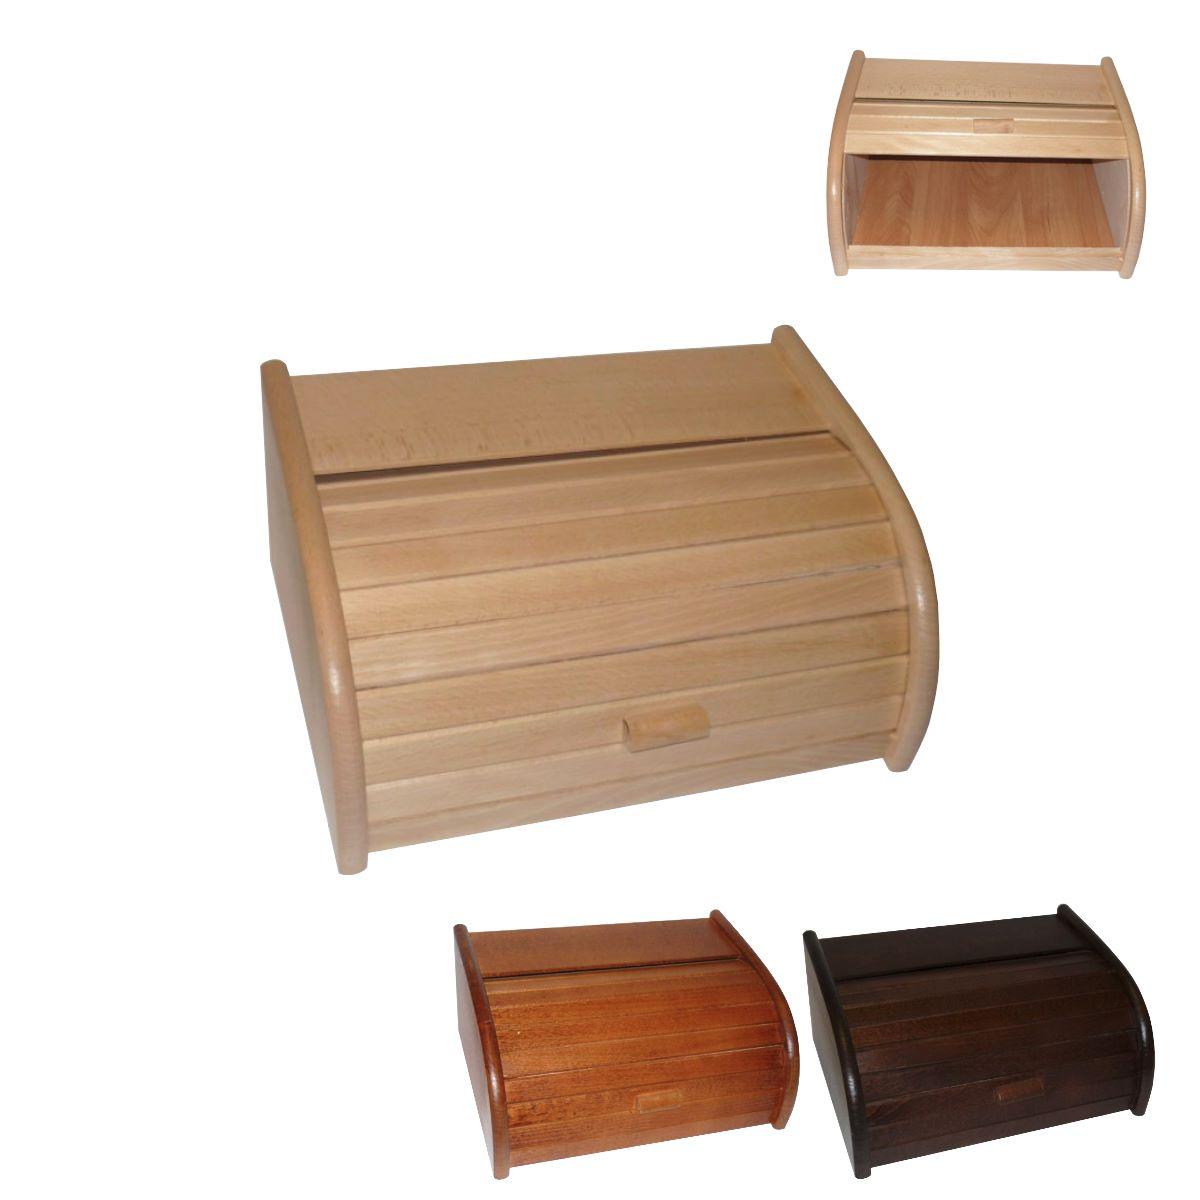 Chlebovka dřevo lak 33,5x24,5x14cm  WOOD, mix barev